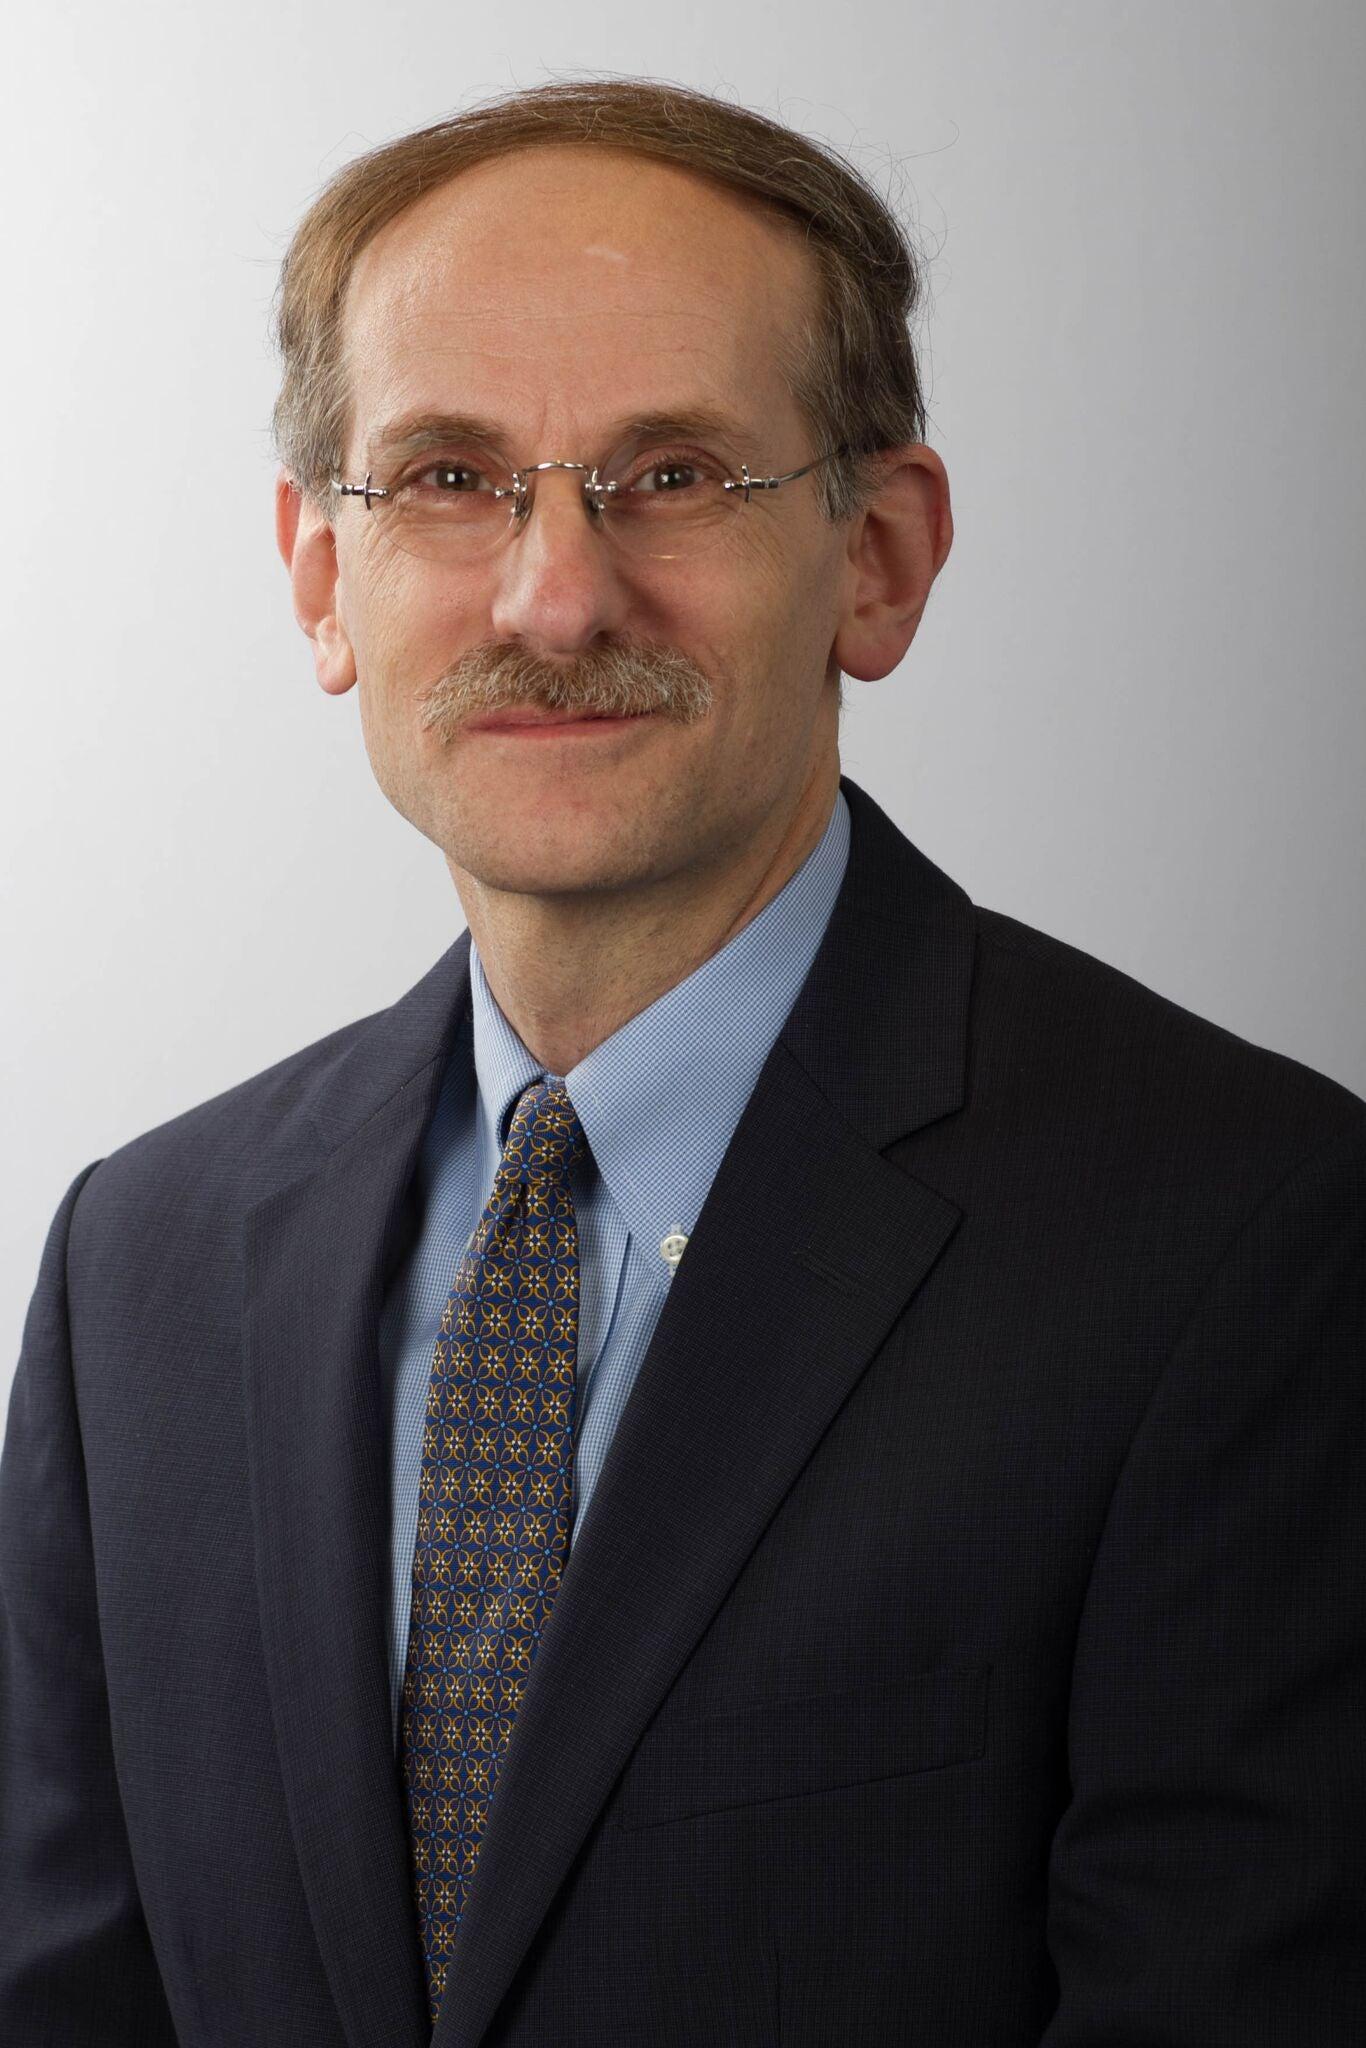 Gary Podorowsky